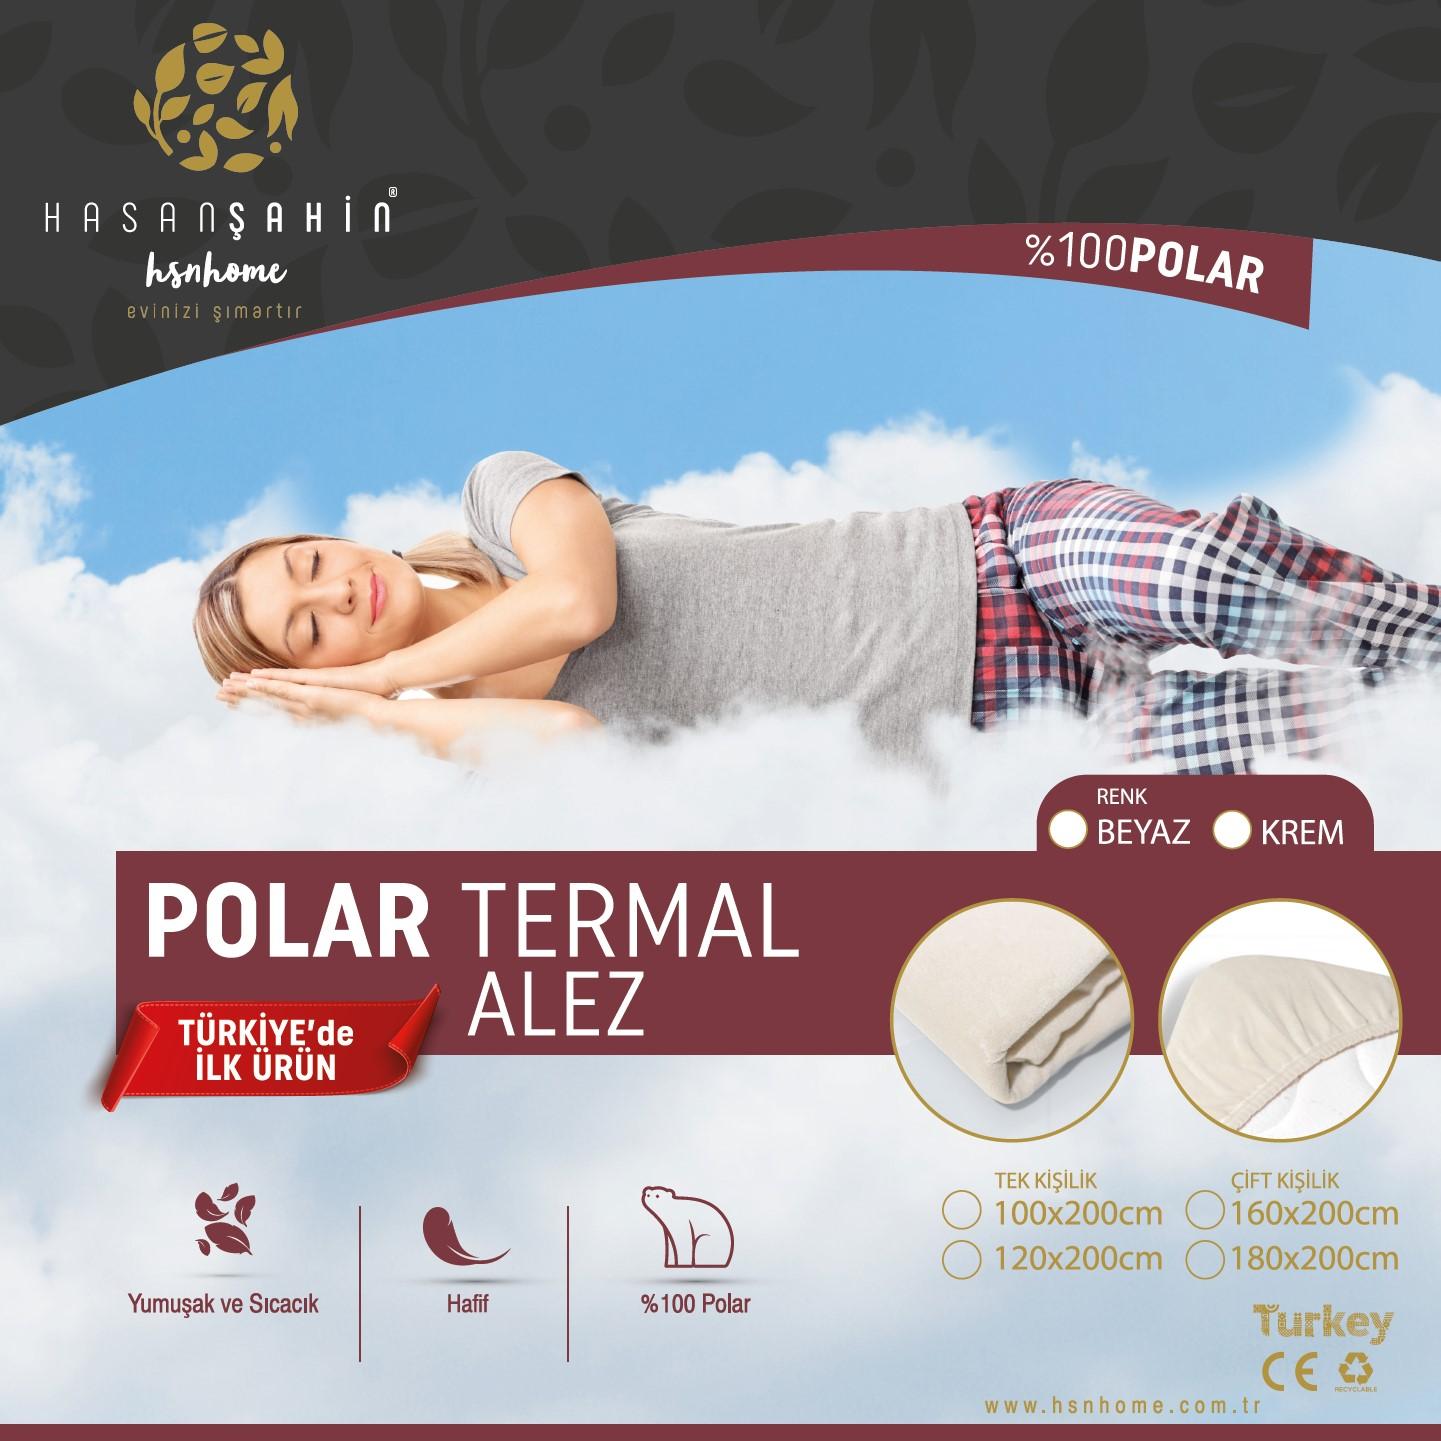 Polar Termal Alez 180x200cm